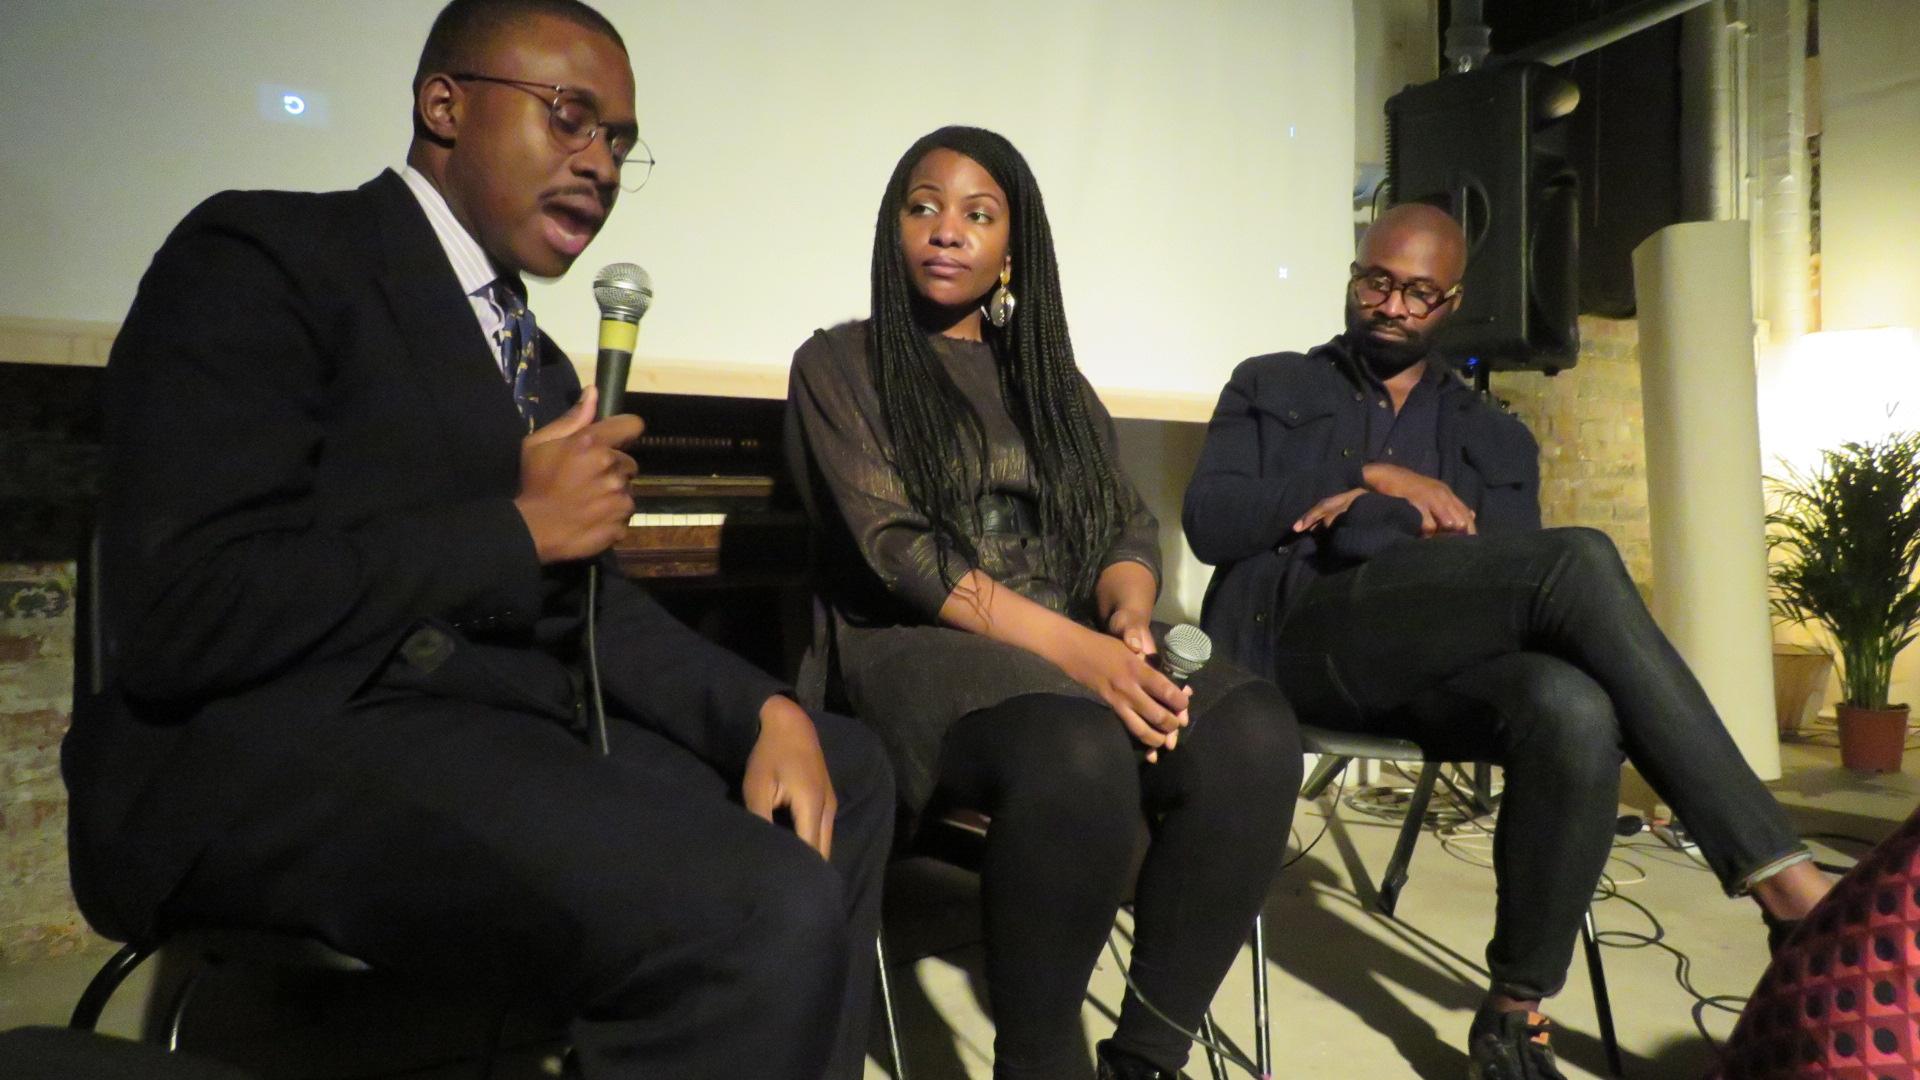 Tomisin Adepeju, Candice Onyeama & Adeyemi Michael